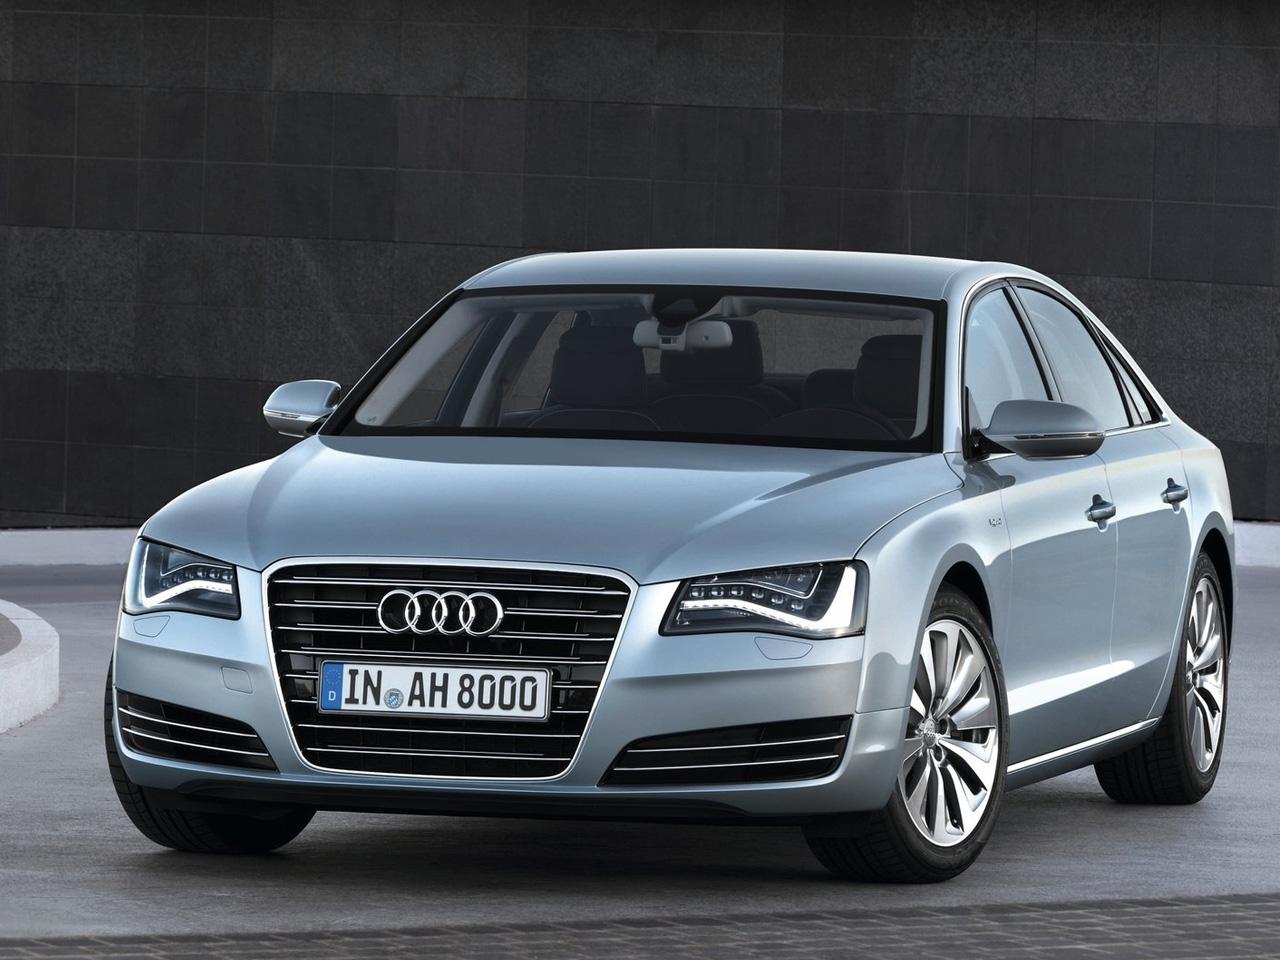 Kelebihan Kekurangan Audi 2013 Murah Berkualitas